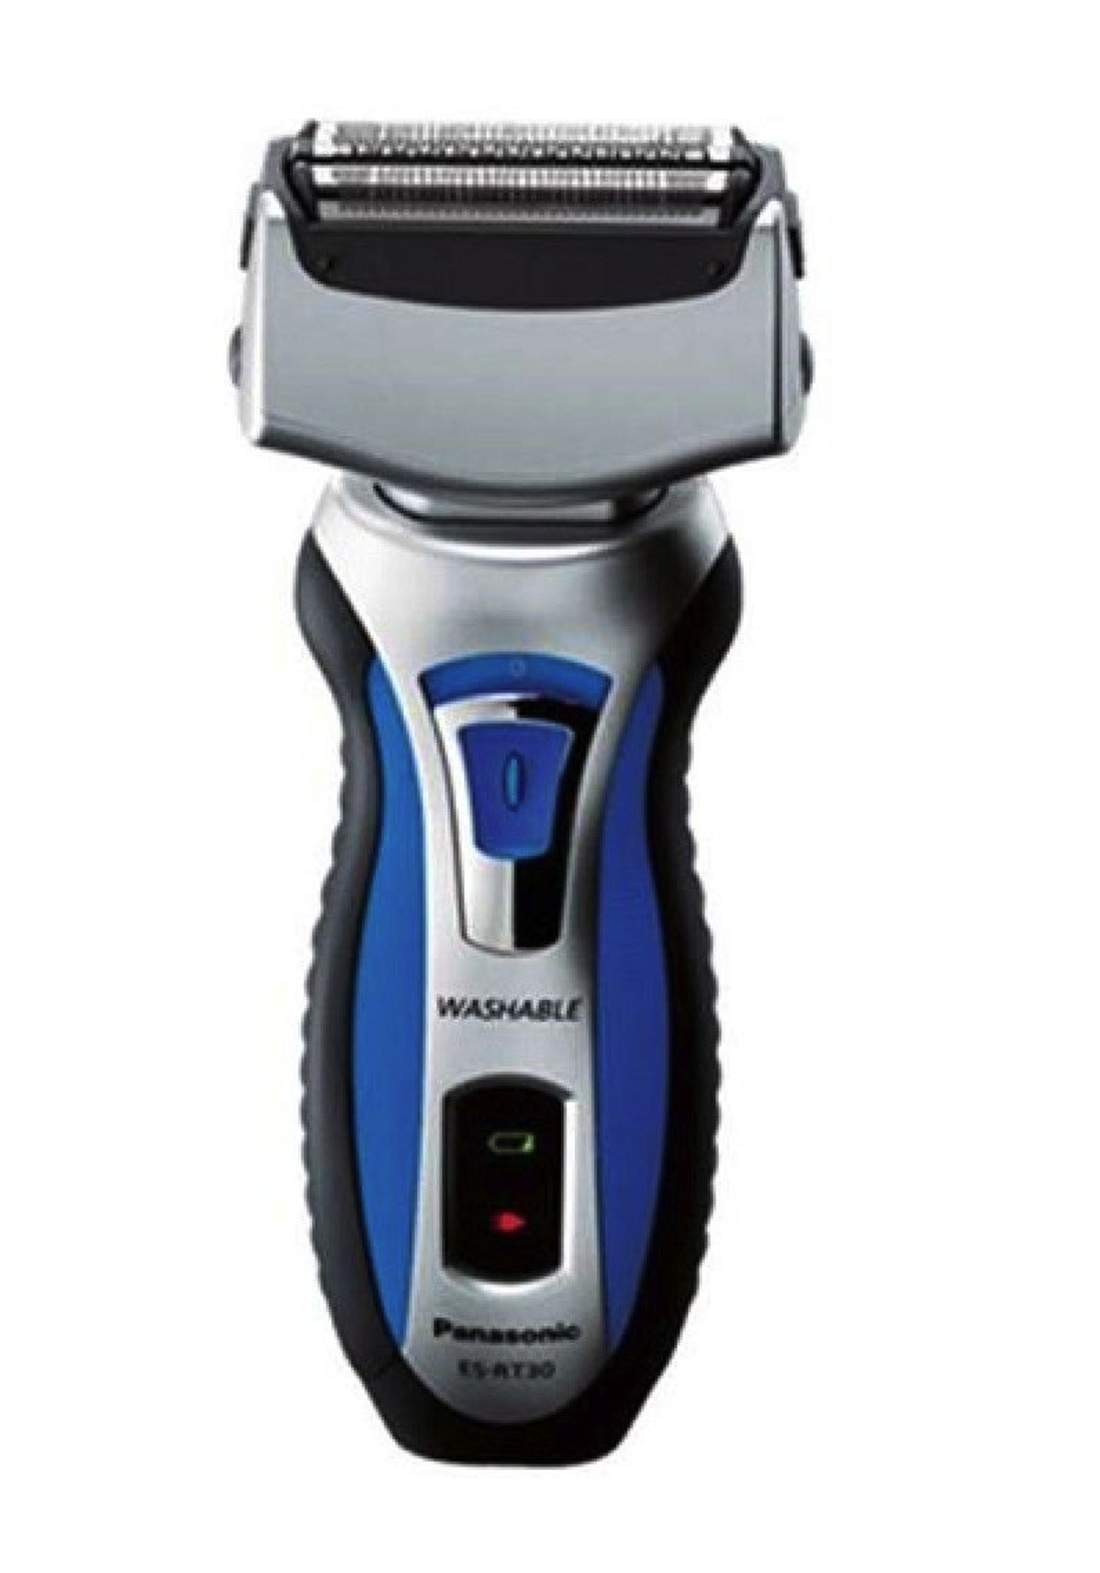 Panasonic ES-RT30-S453 Cord/Cordless Shaver 3 Blade Cutting System ماكينة حلاقة